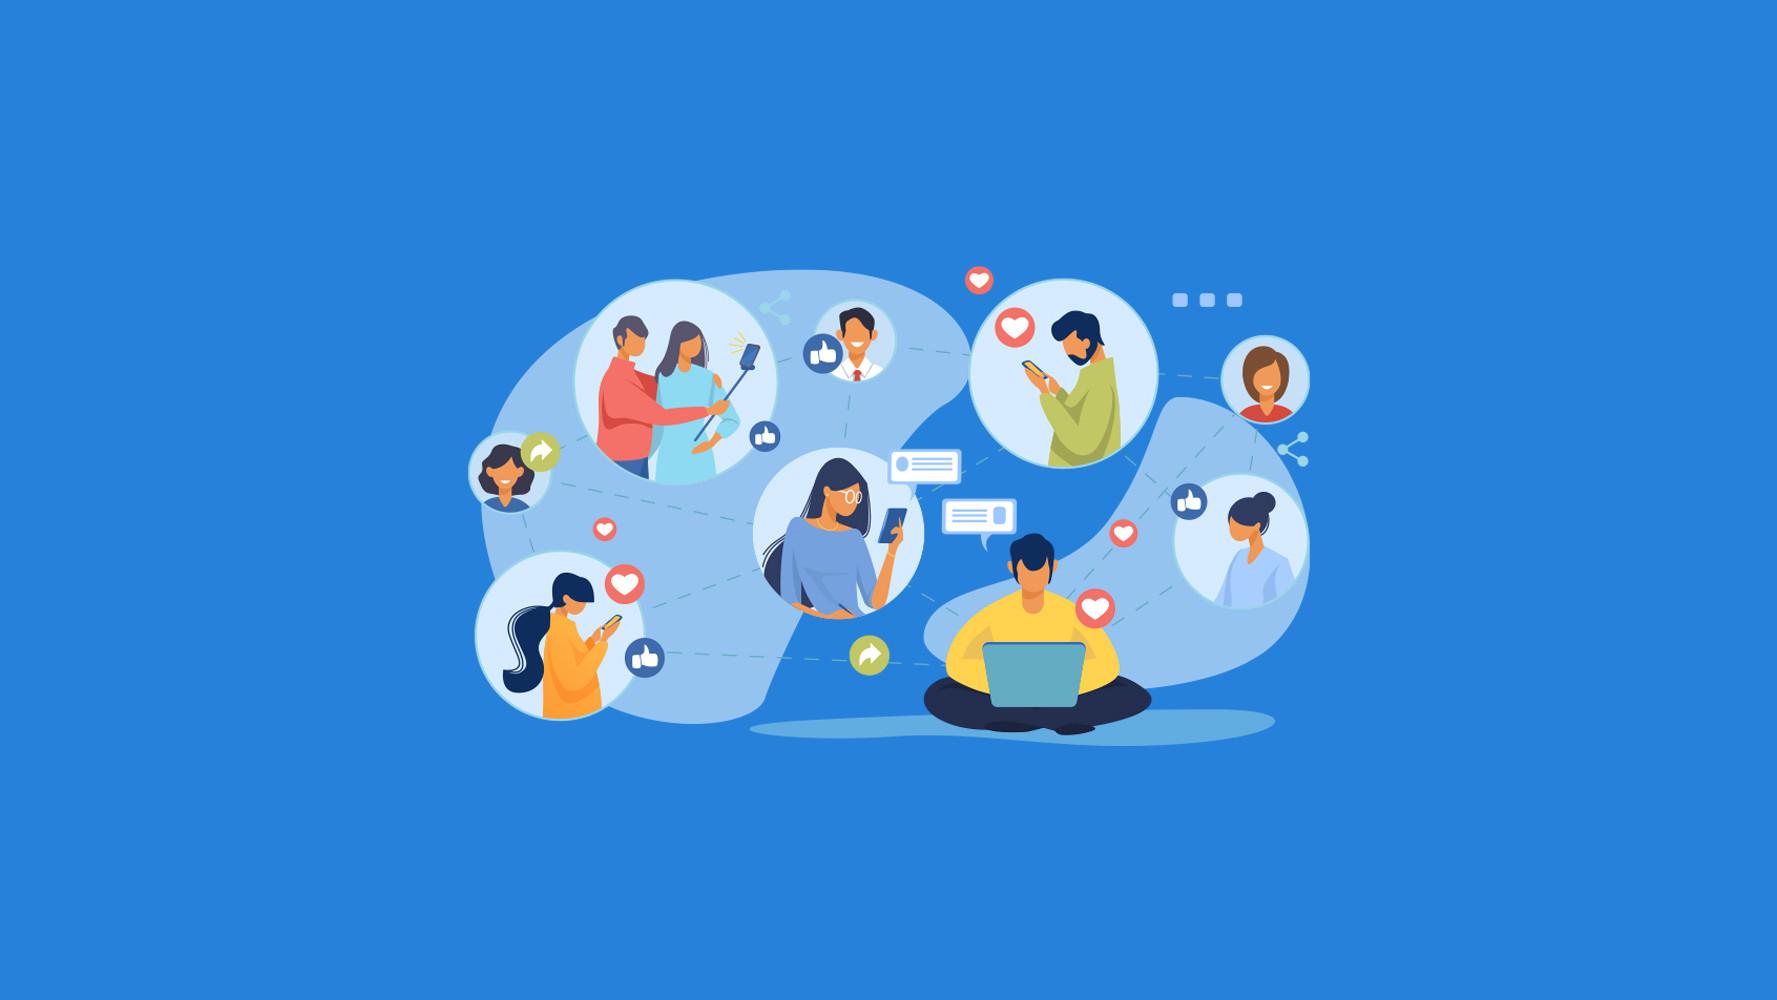 networking online 2020